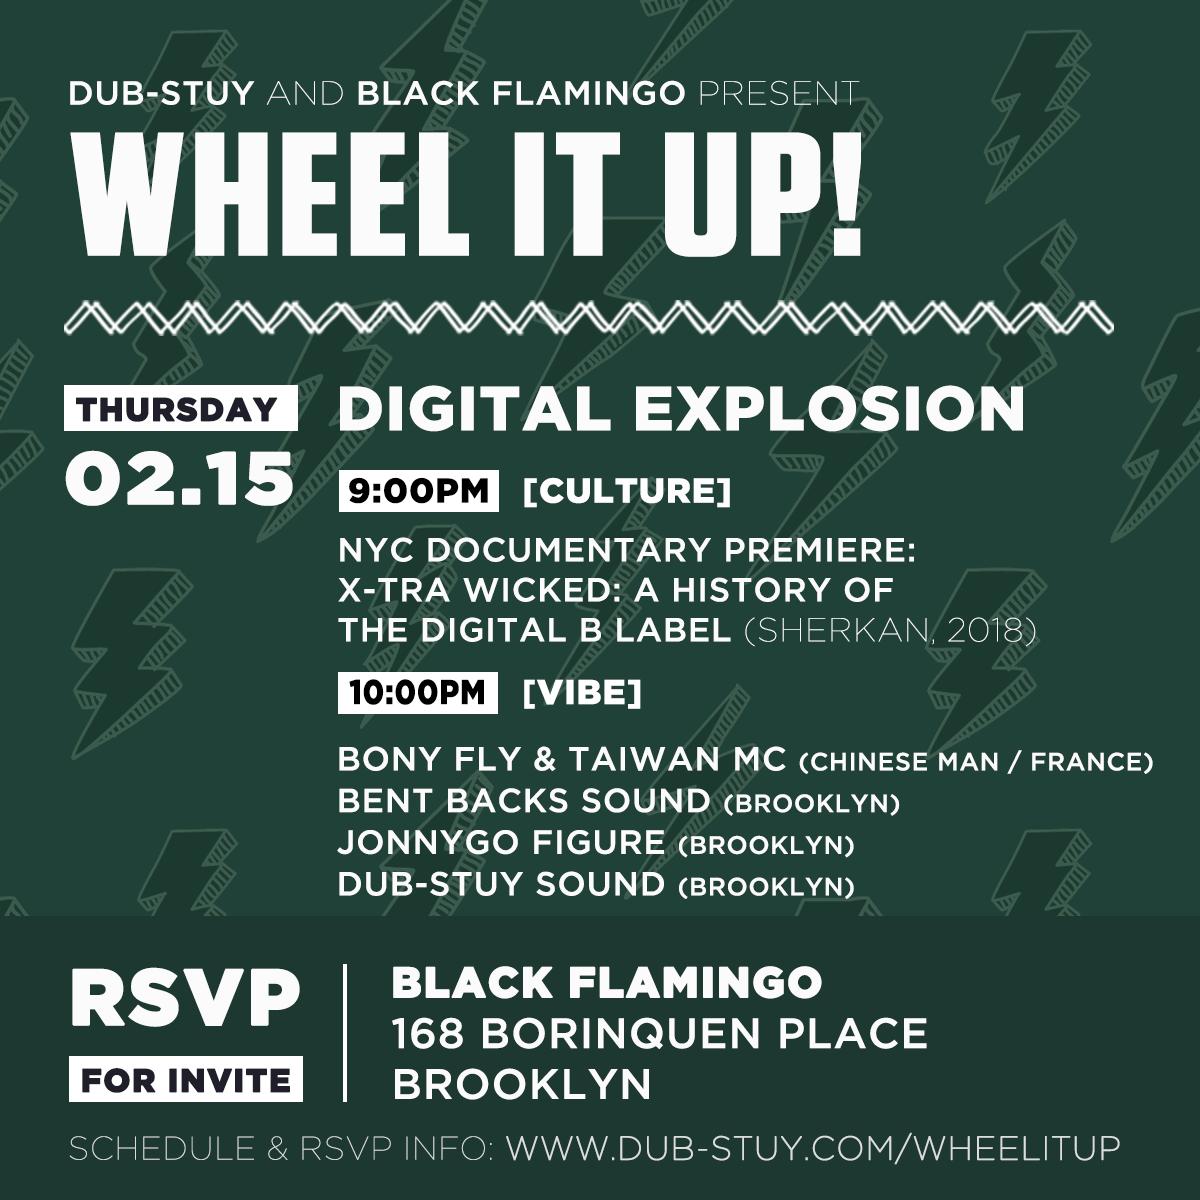 Wheel it Up - IG (Digital Explosion).jpg